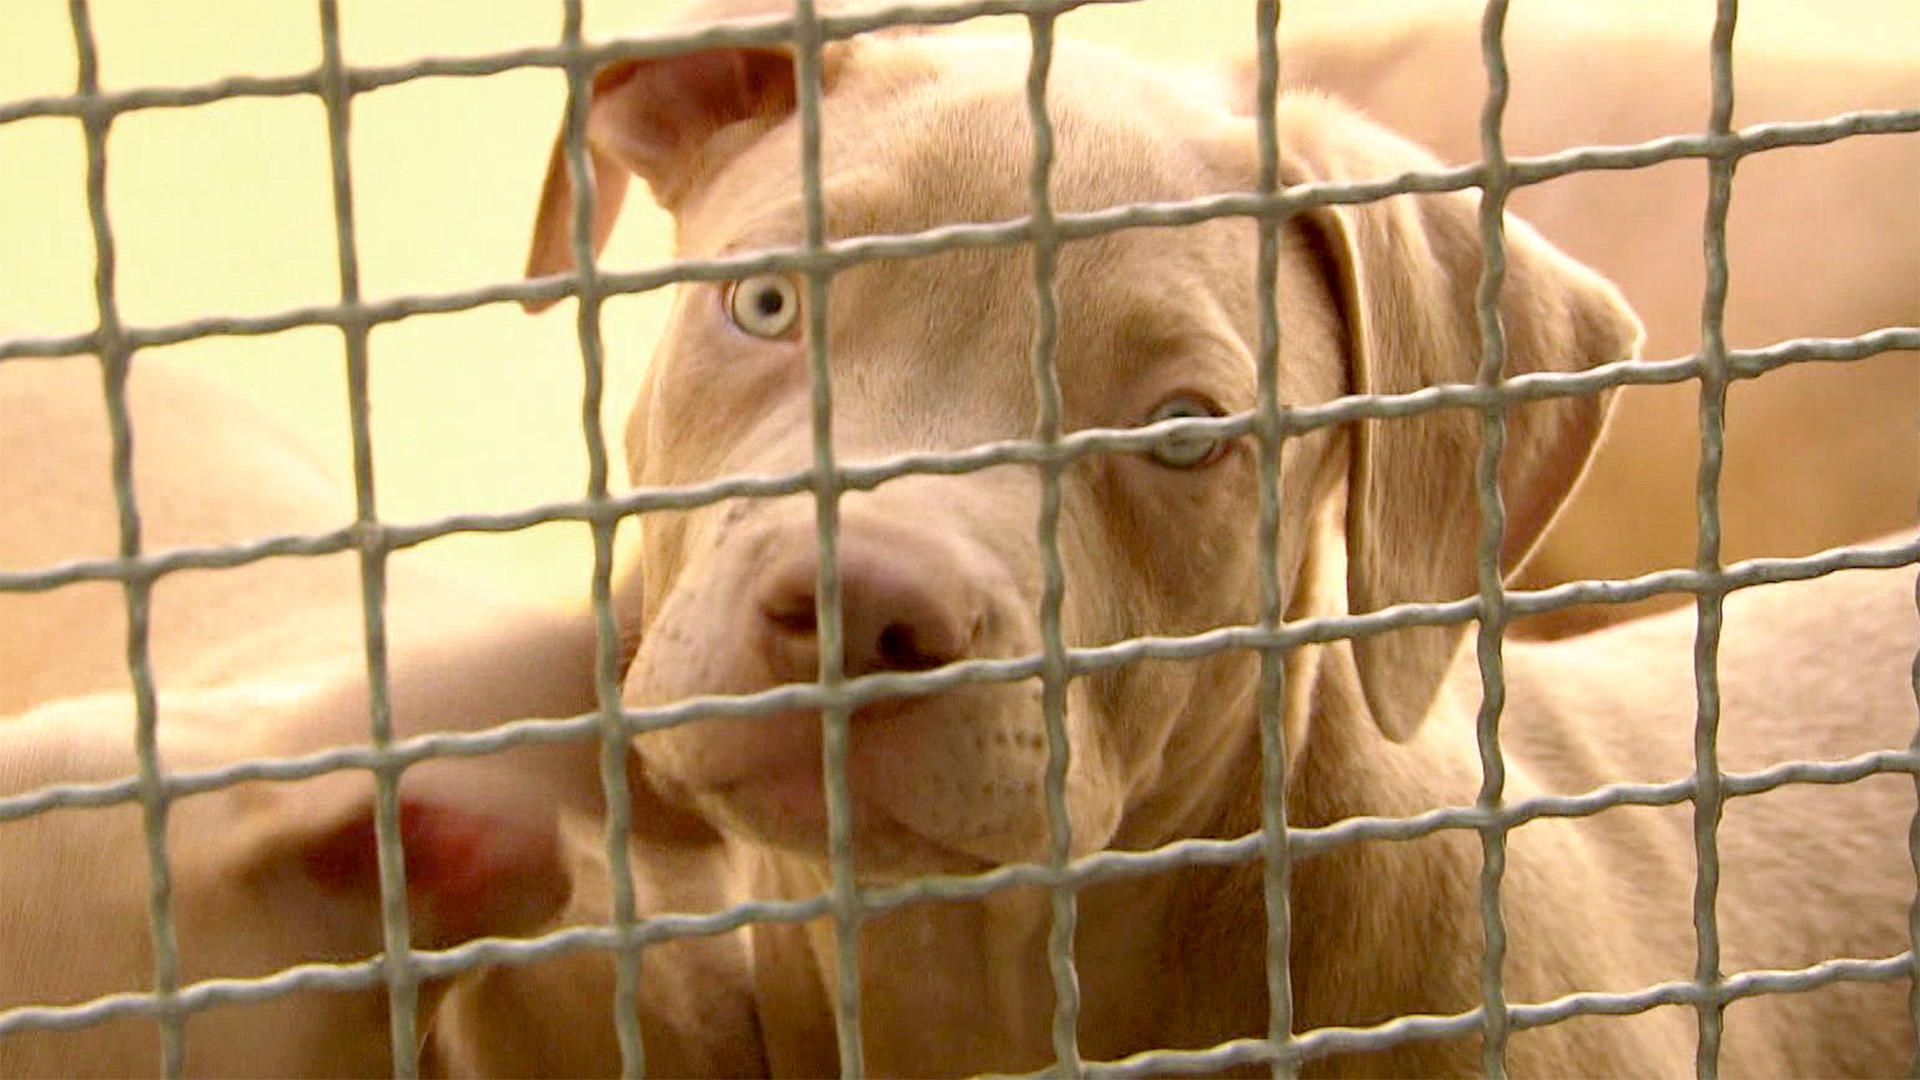 Heute: Ausnahmezustand im Tierheim Freital | Folge 1